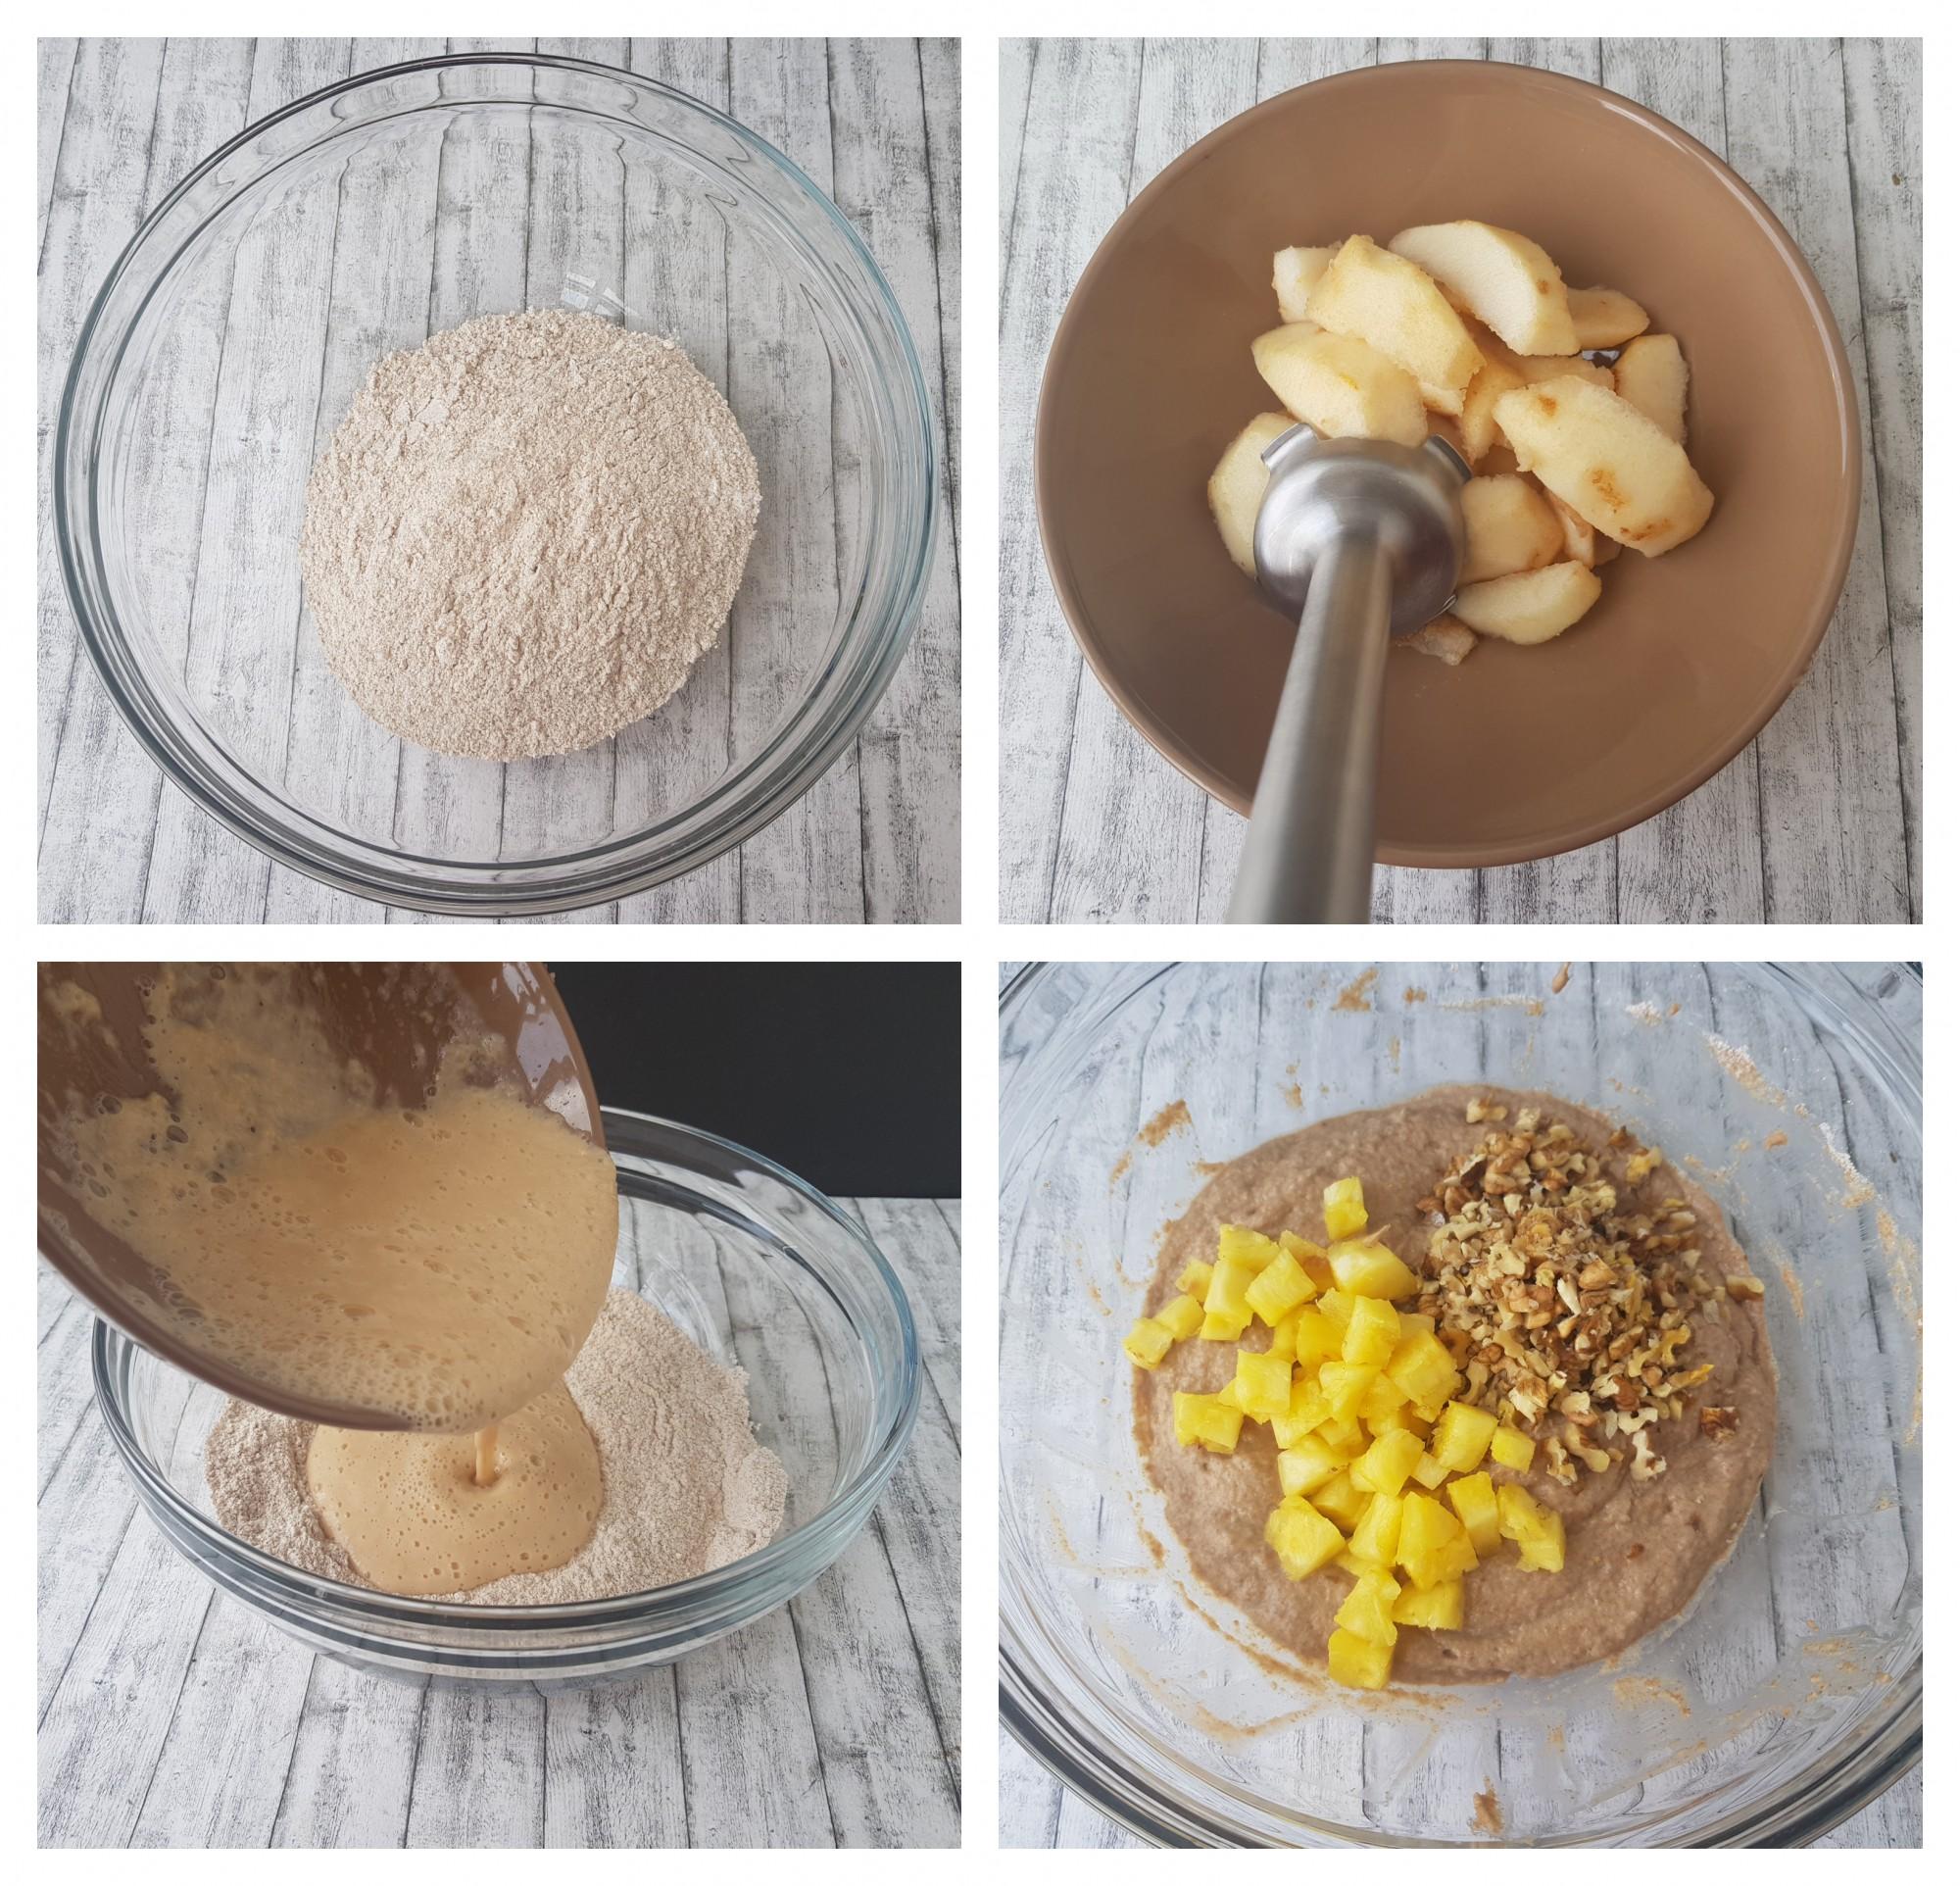 chec cu pere si ananas - foodieopedia